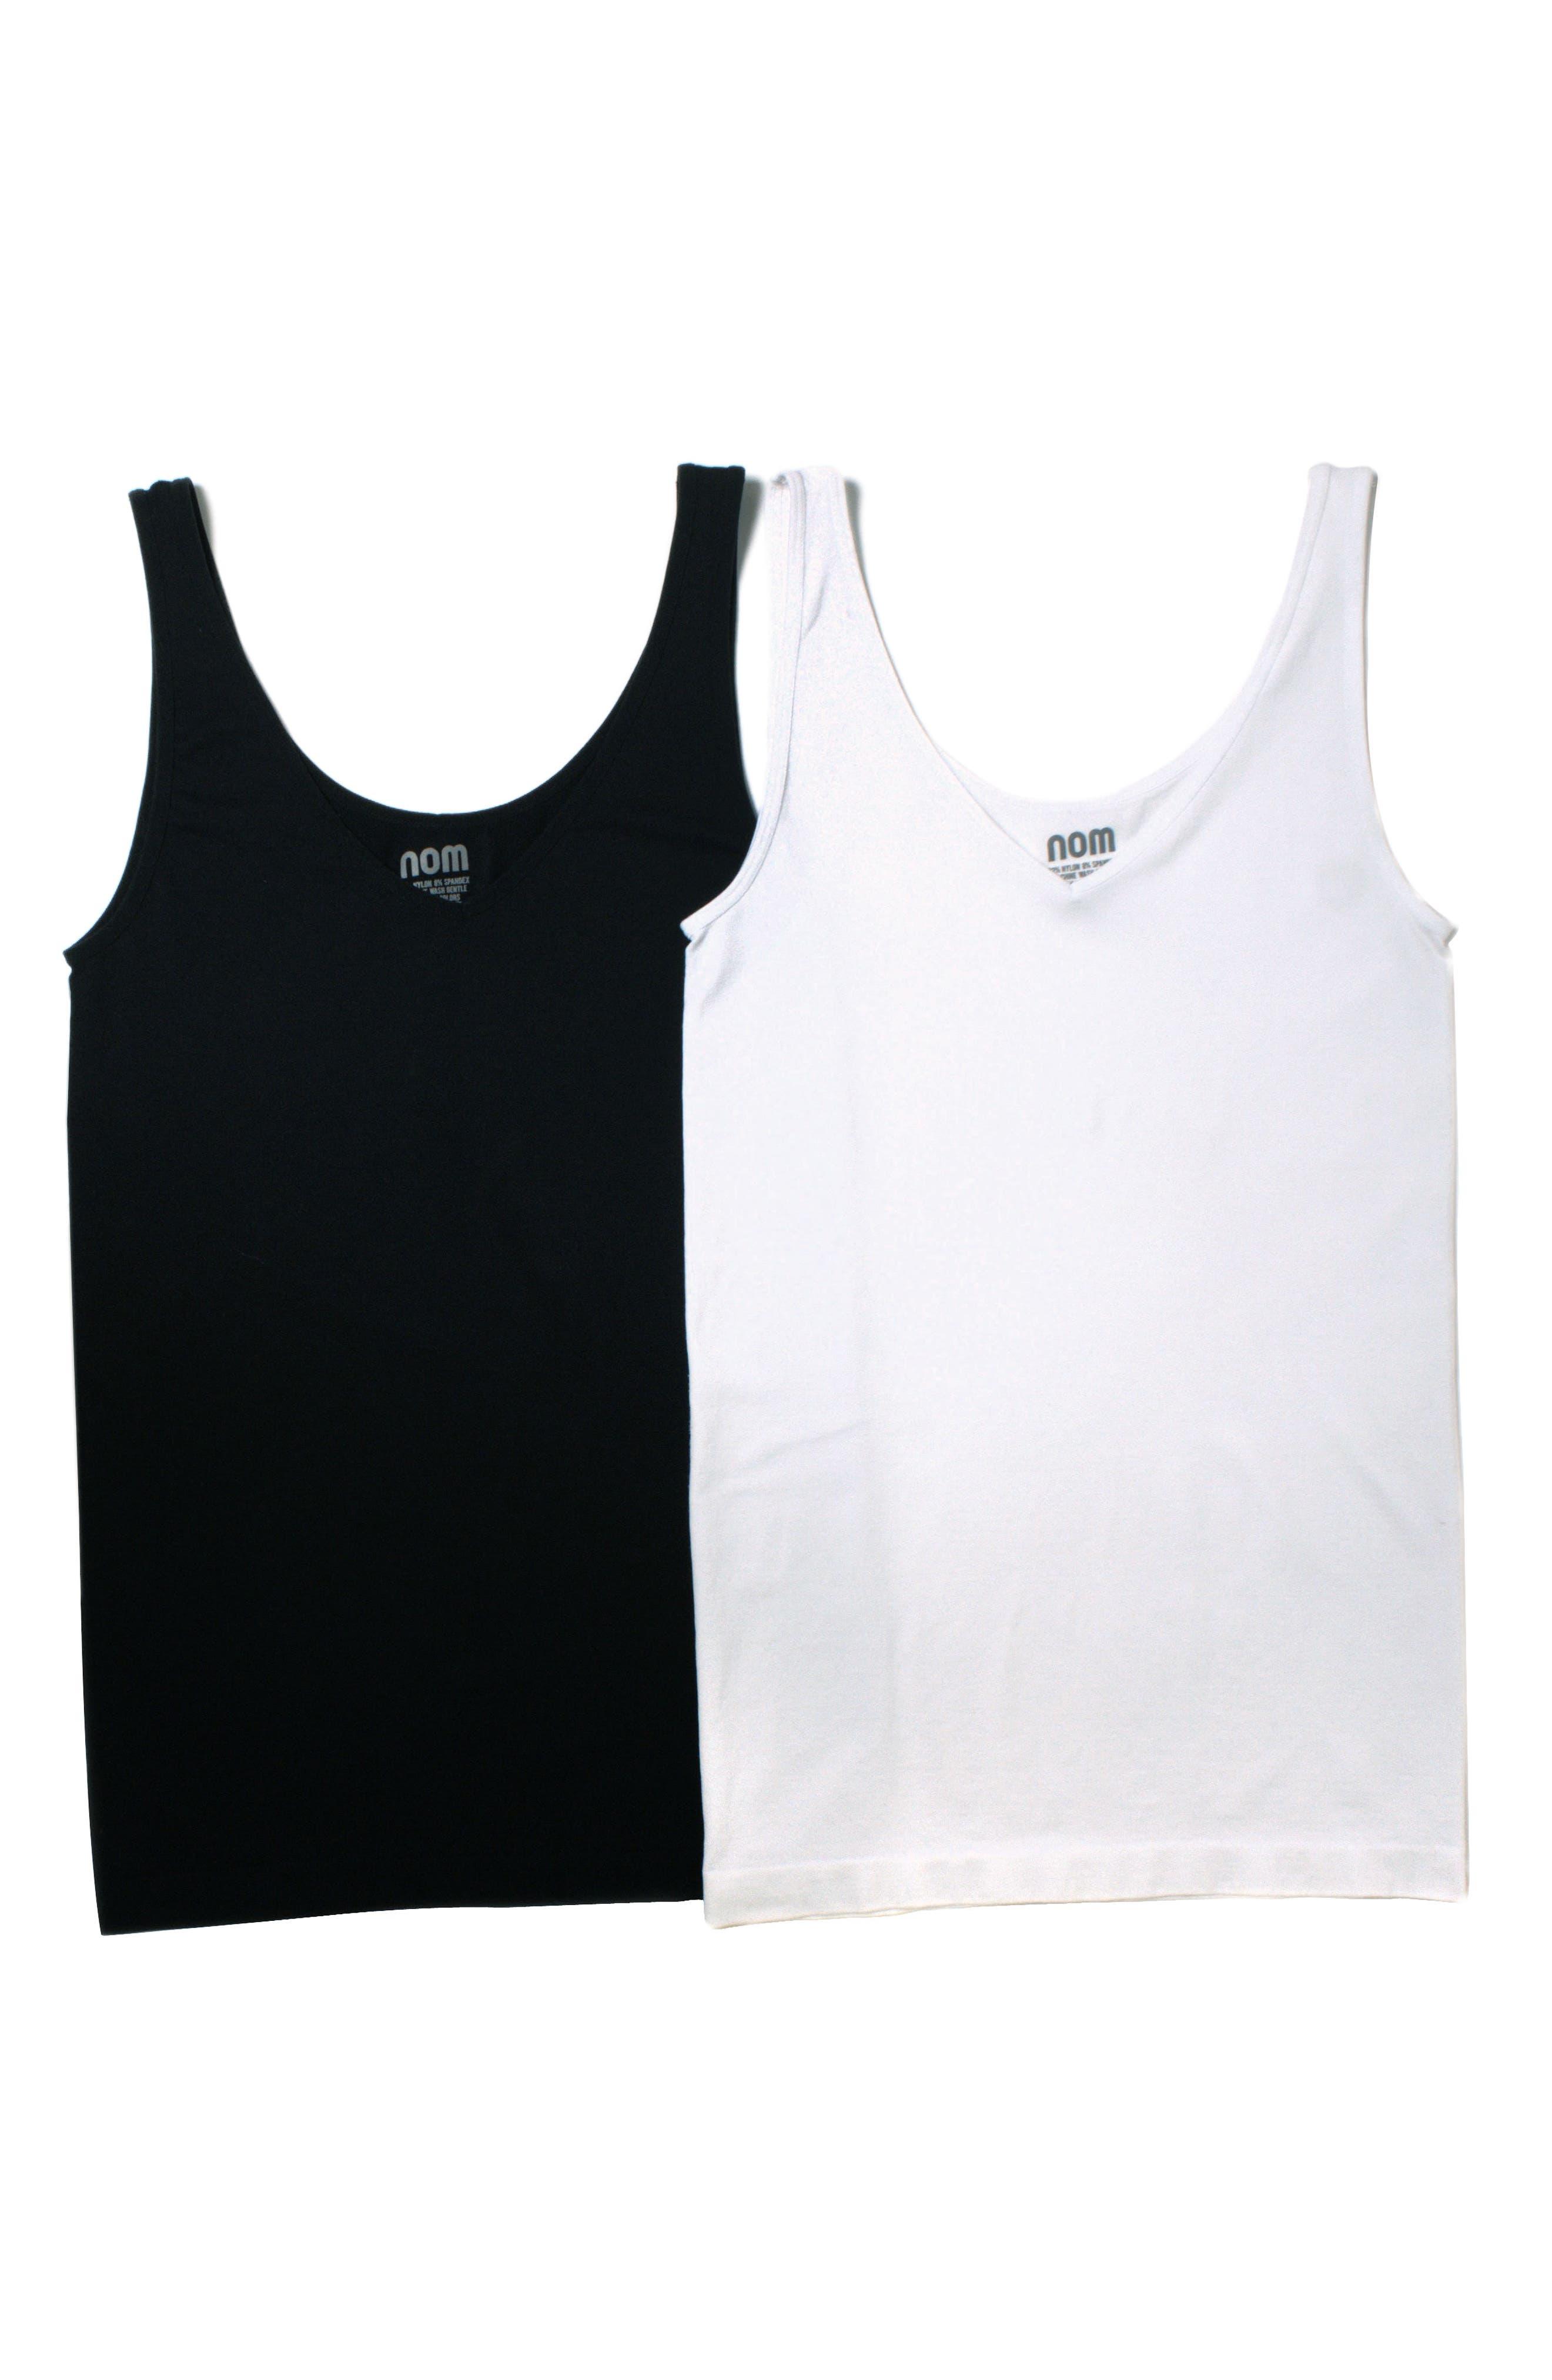 2-Pack Seamless Maternity Tanks,                             Main thumbnail 1, color,                             Black And White Set